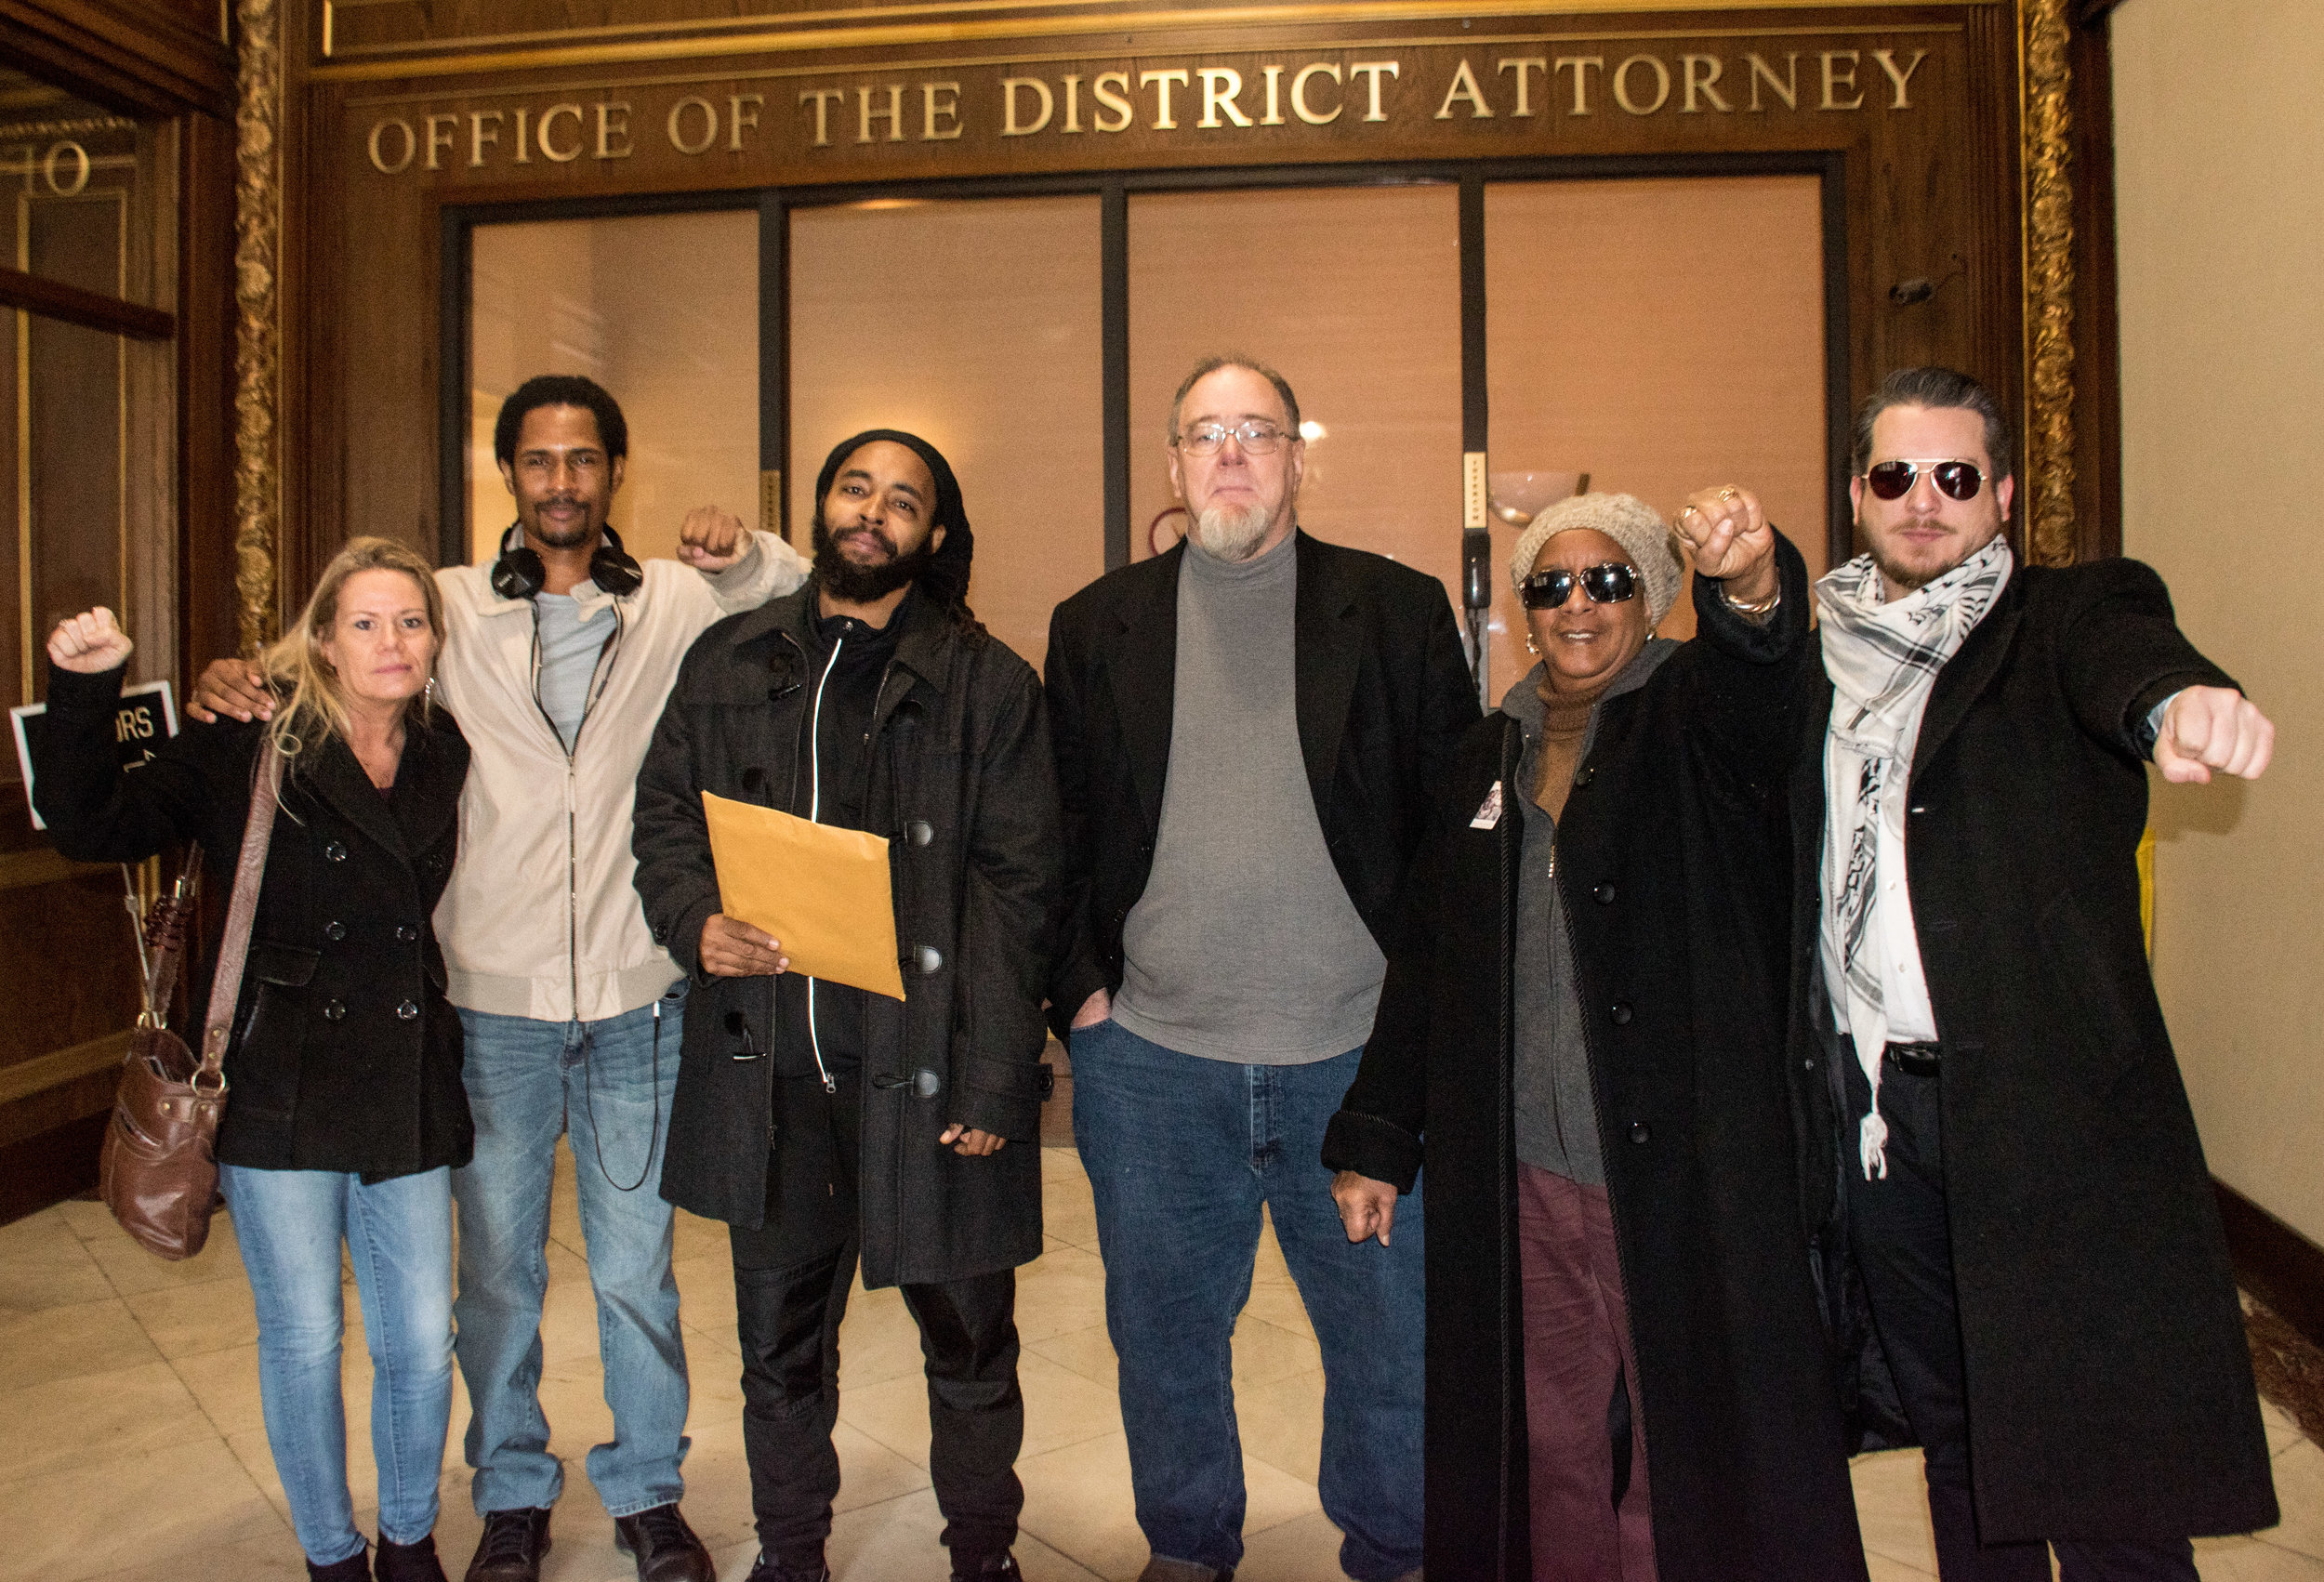 Jan 7, 2019 Thousands of Mumia Abu-Jamal Petitions delivered to DA Krasner  L to R: Sandy Joy, Mike Africa JR, Wayne Cook, John Kirkland, Linda Ragin, Ted Kelly